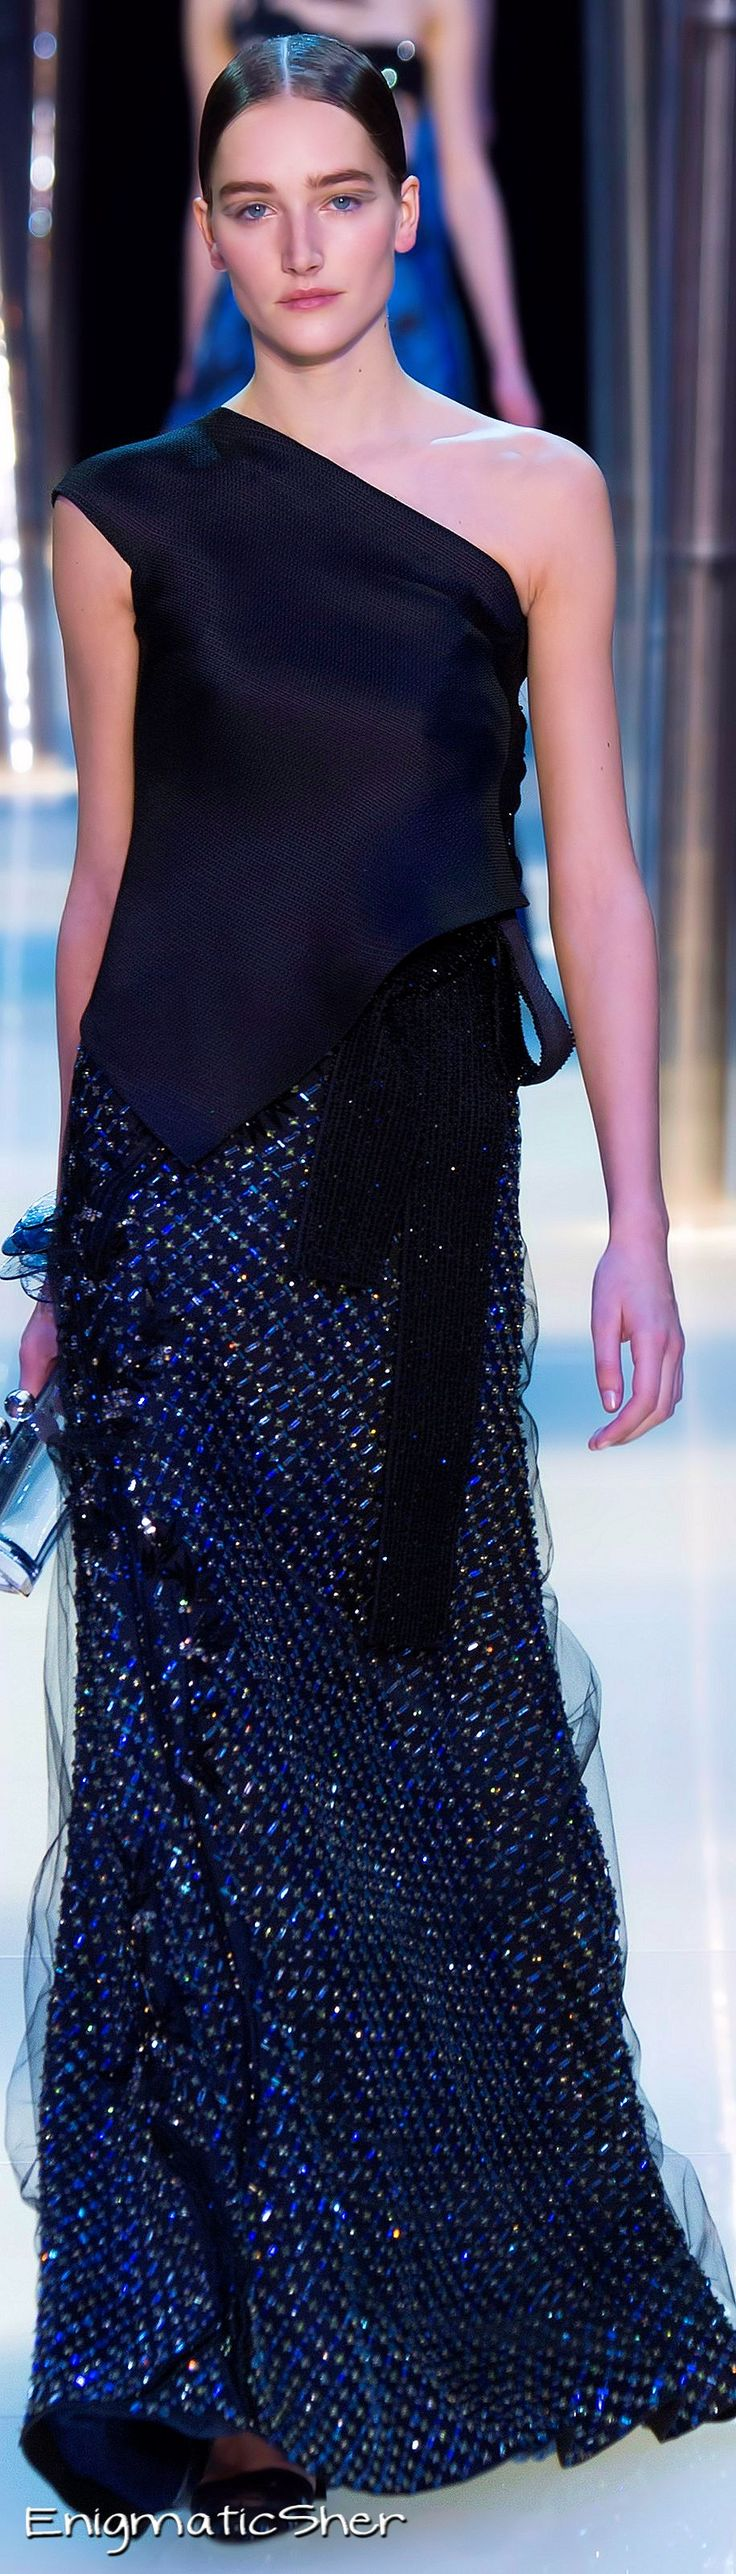 78 Best ideas about Midnight Blue Dresses on Pinterest - Midnight ...